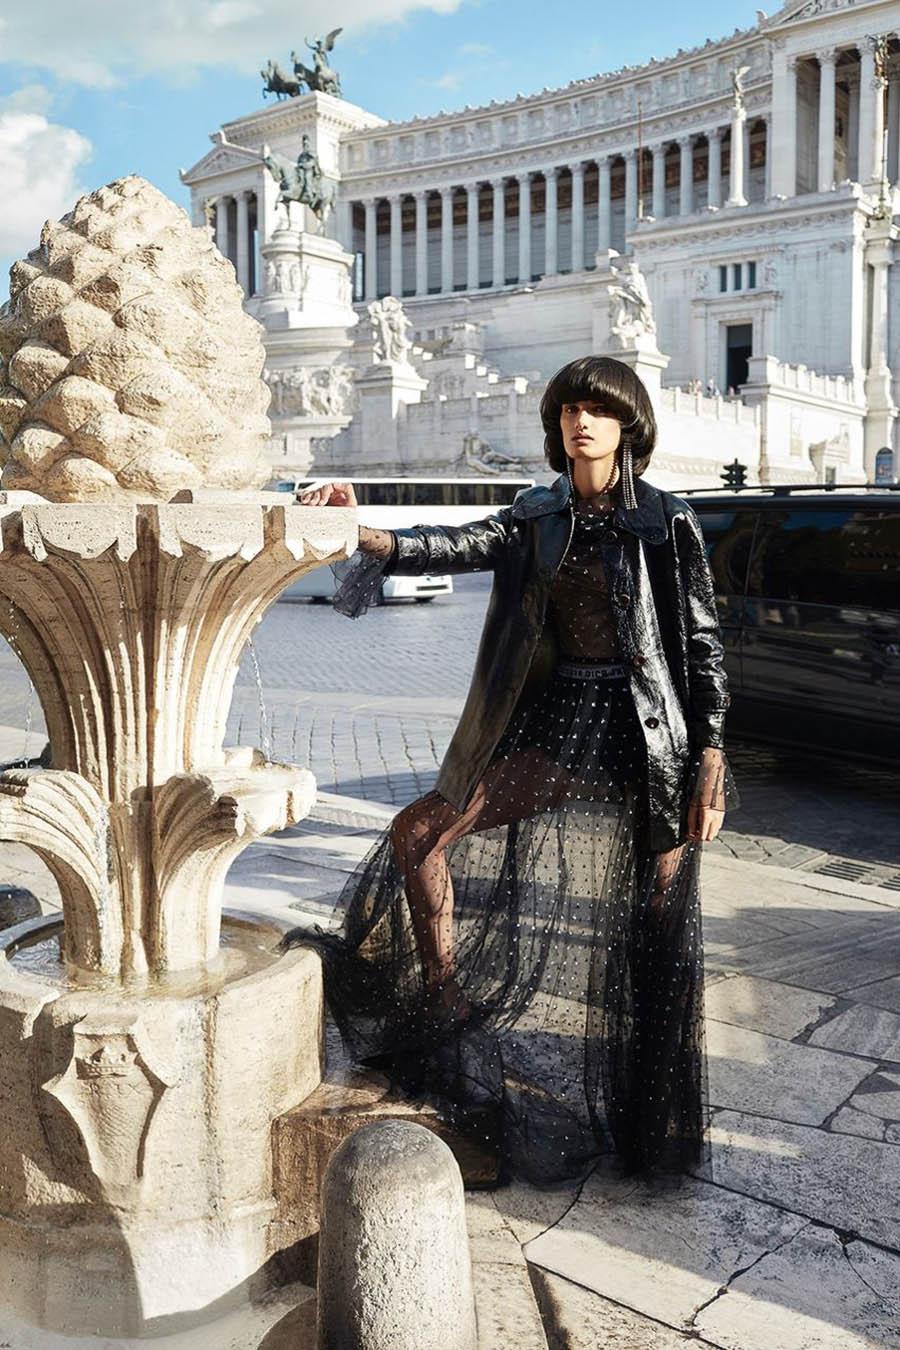 Dipti Sharma by Agata Pospieszynska for Harper's Bazaar Russia December 2017